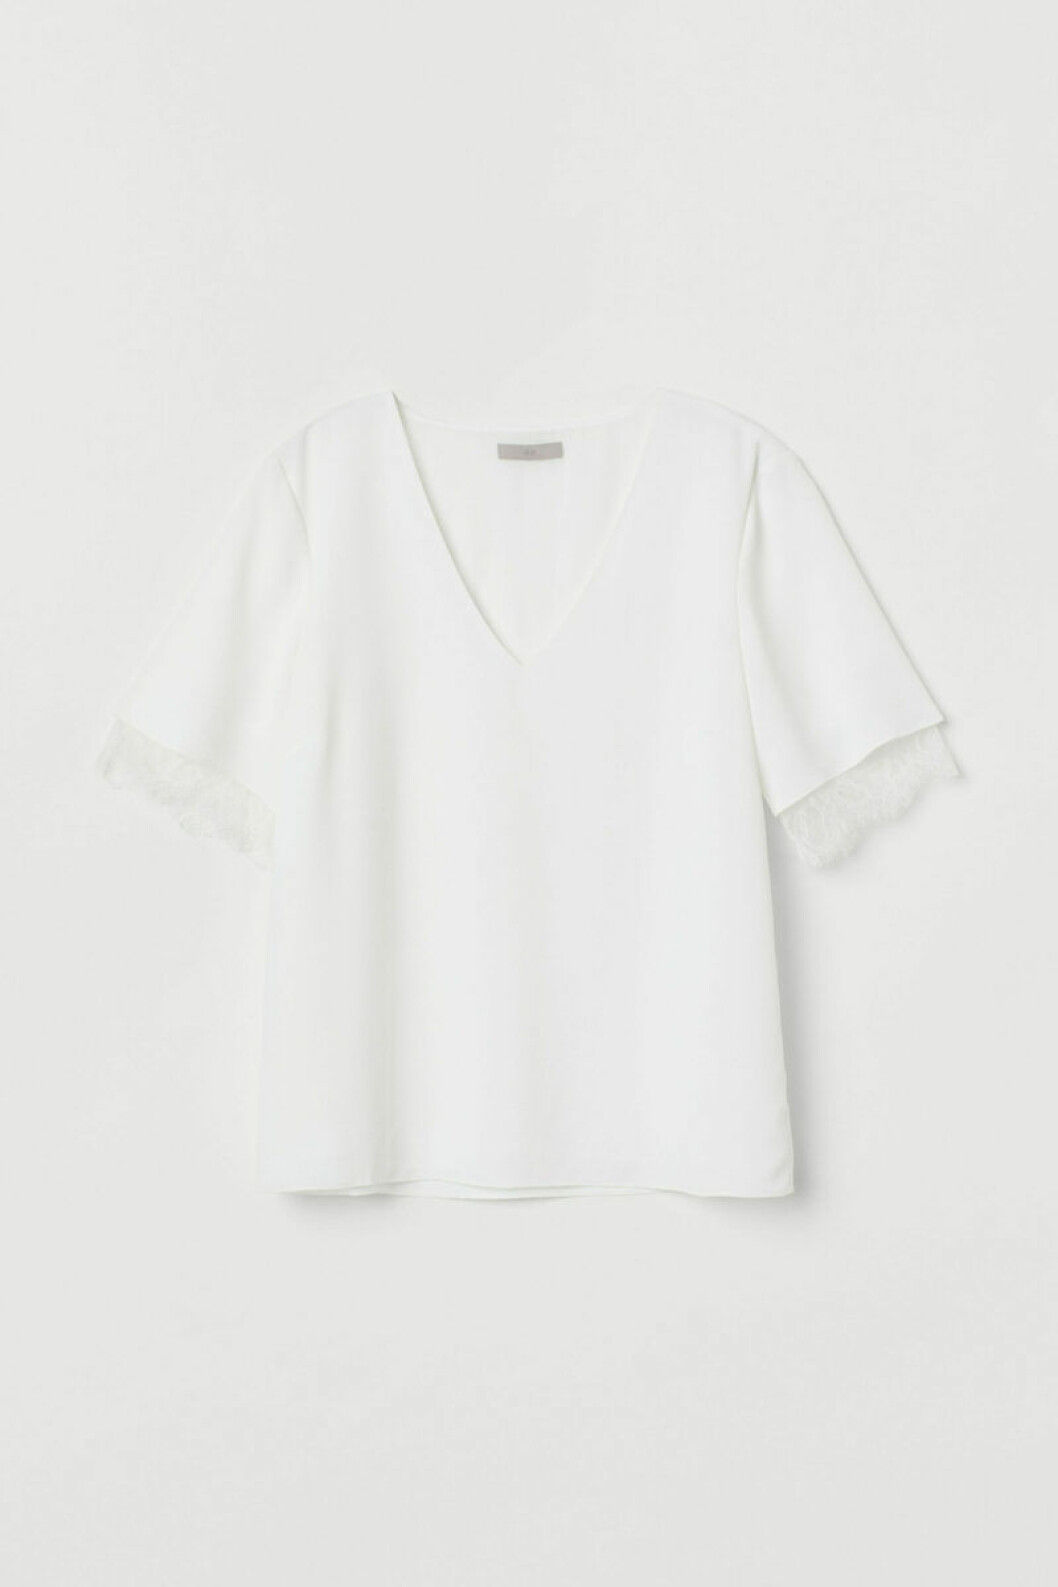 Vit t-shirt med spets